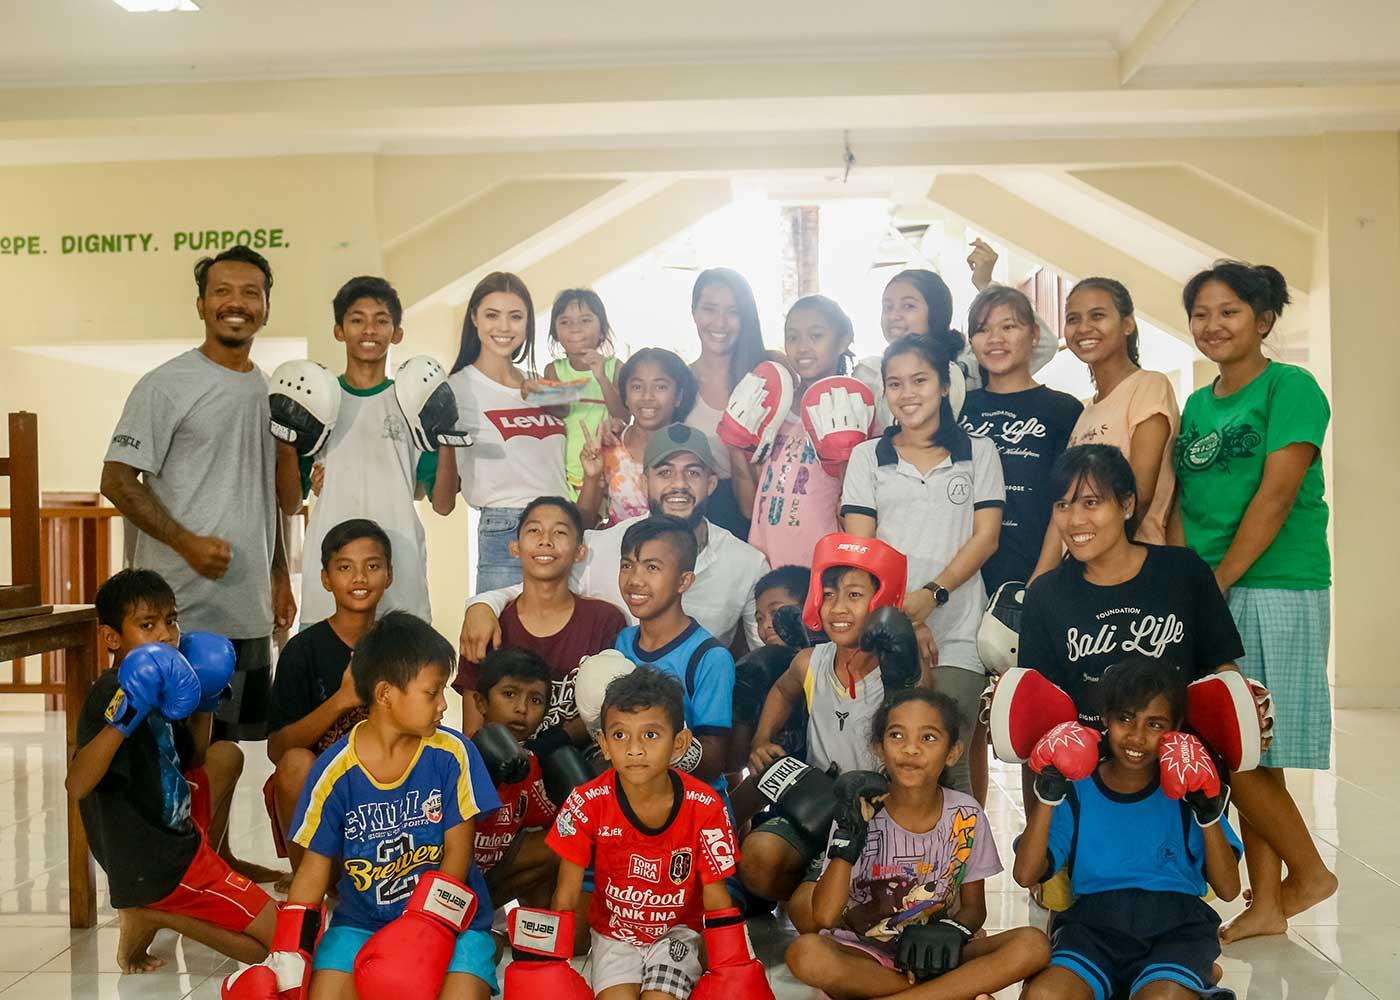 Tyson Pedro Bali Life Foundation